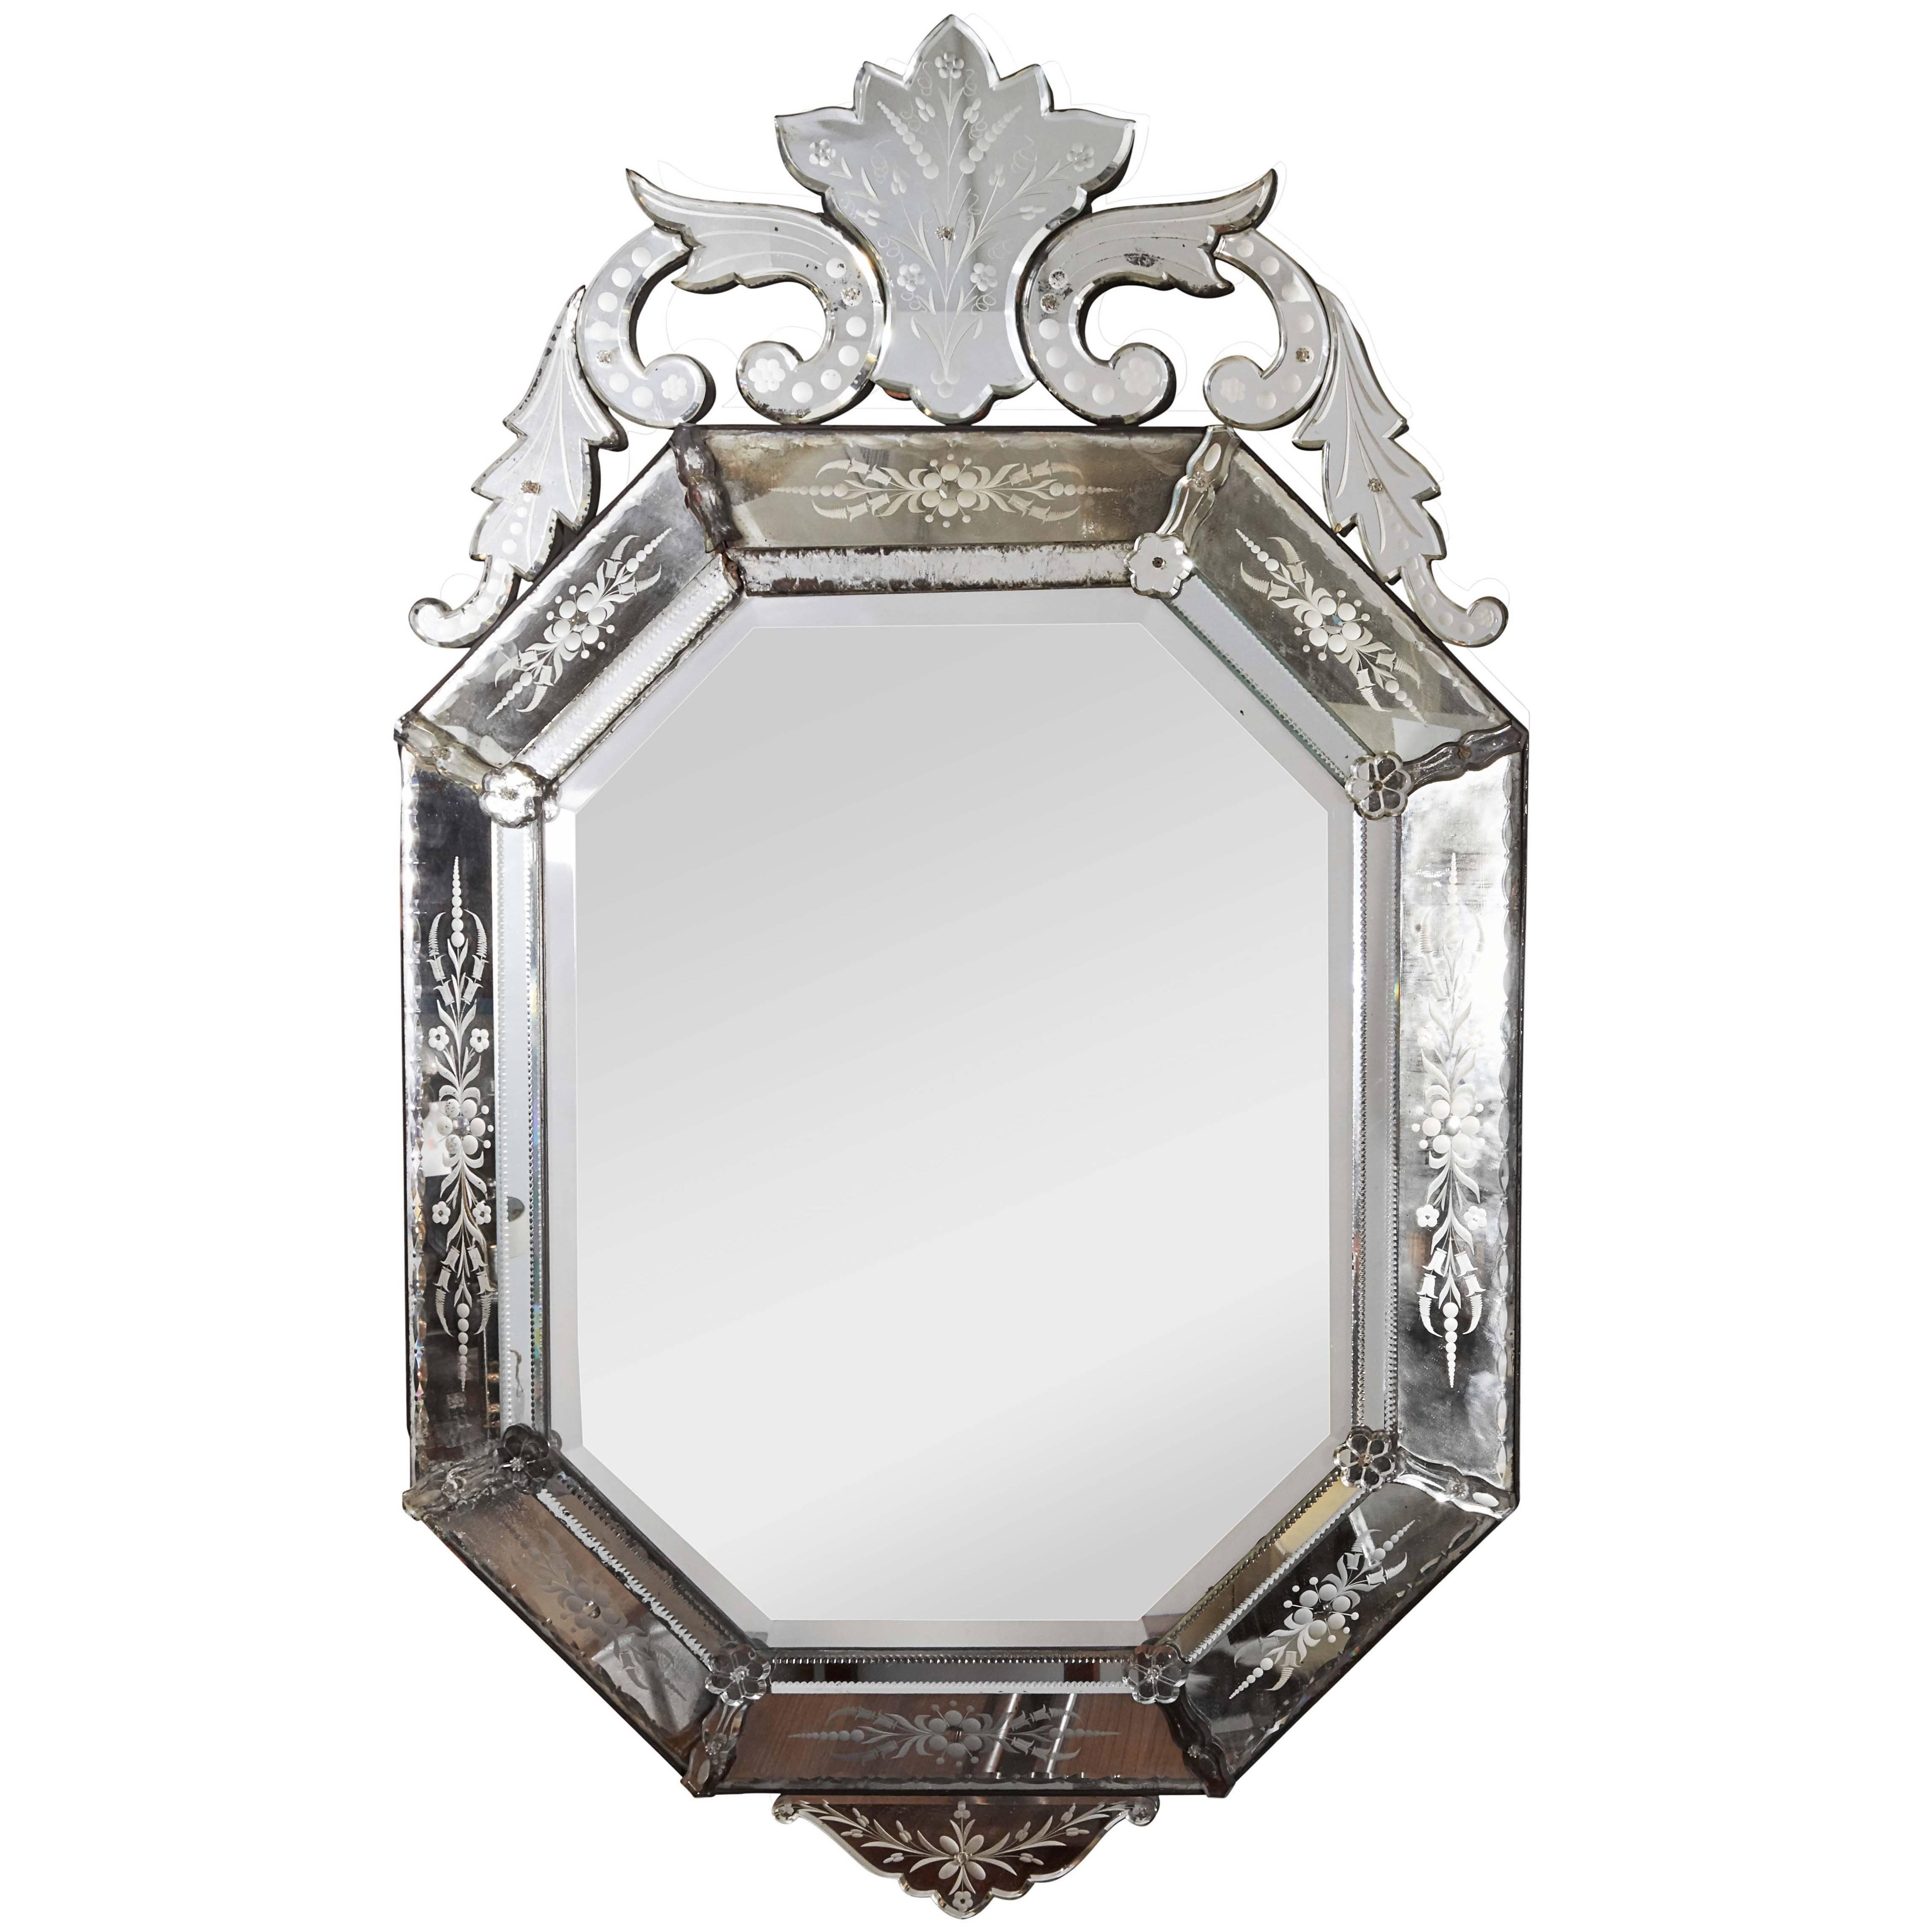 Hollywood Regency Venetian Octagonal Wall Mirror